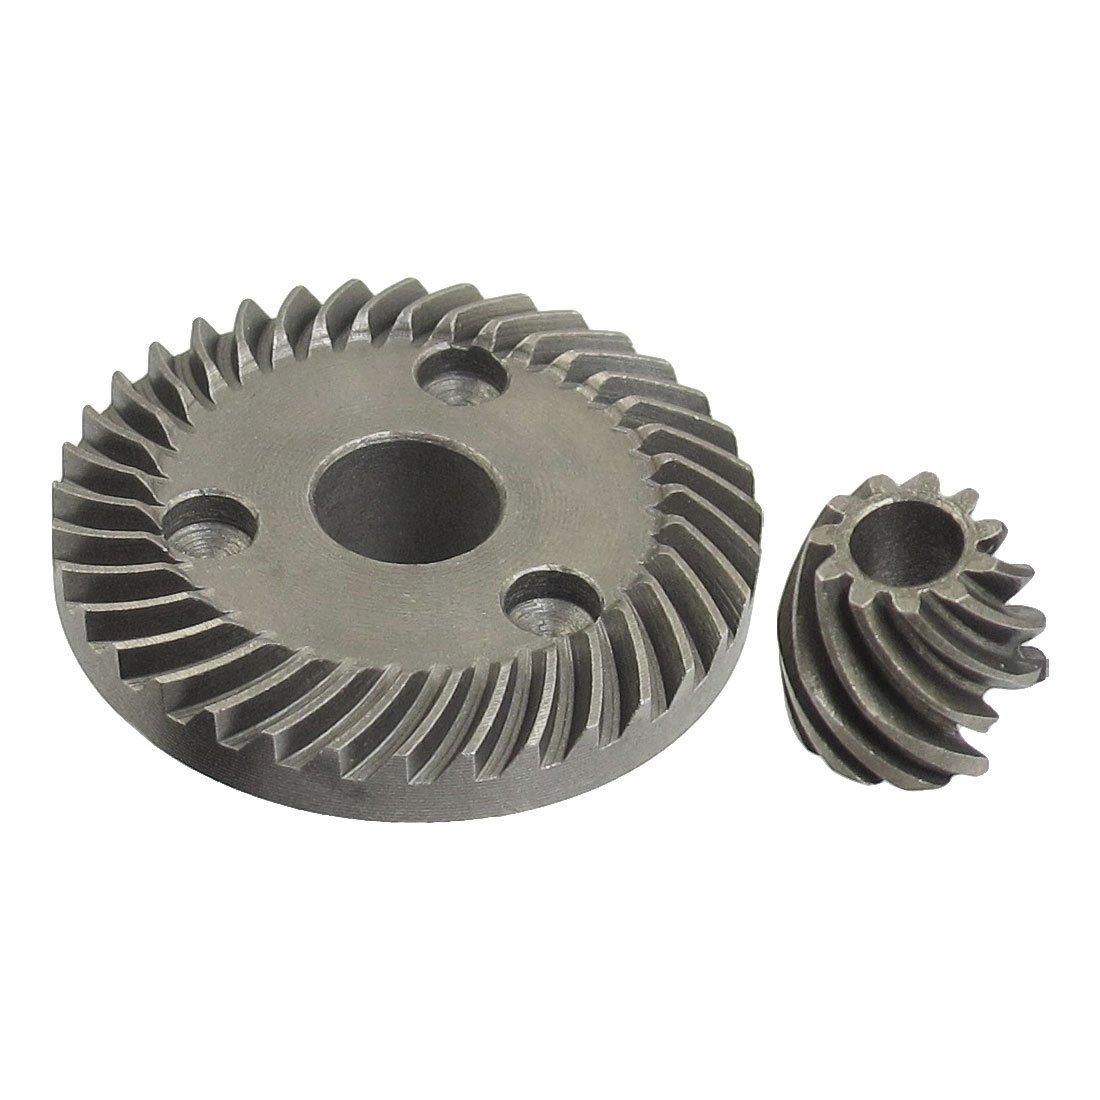 Bevel gear made of steel module 1 19 teeth i=1:1 milled MAEDLER 36051000